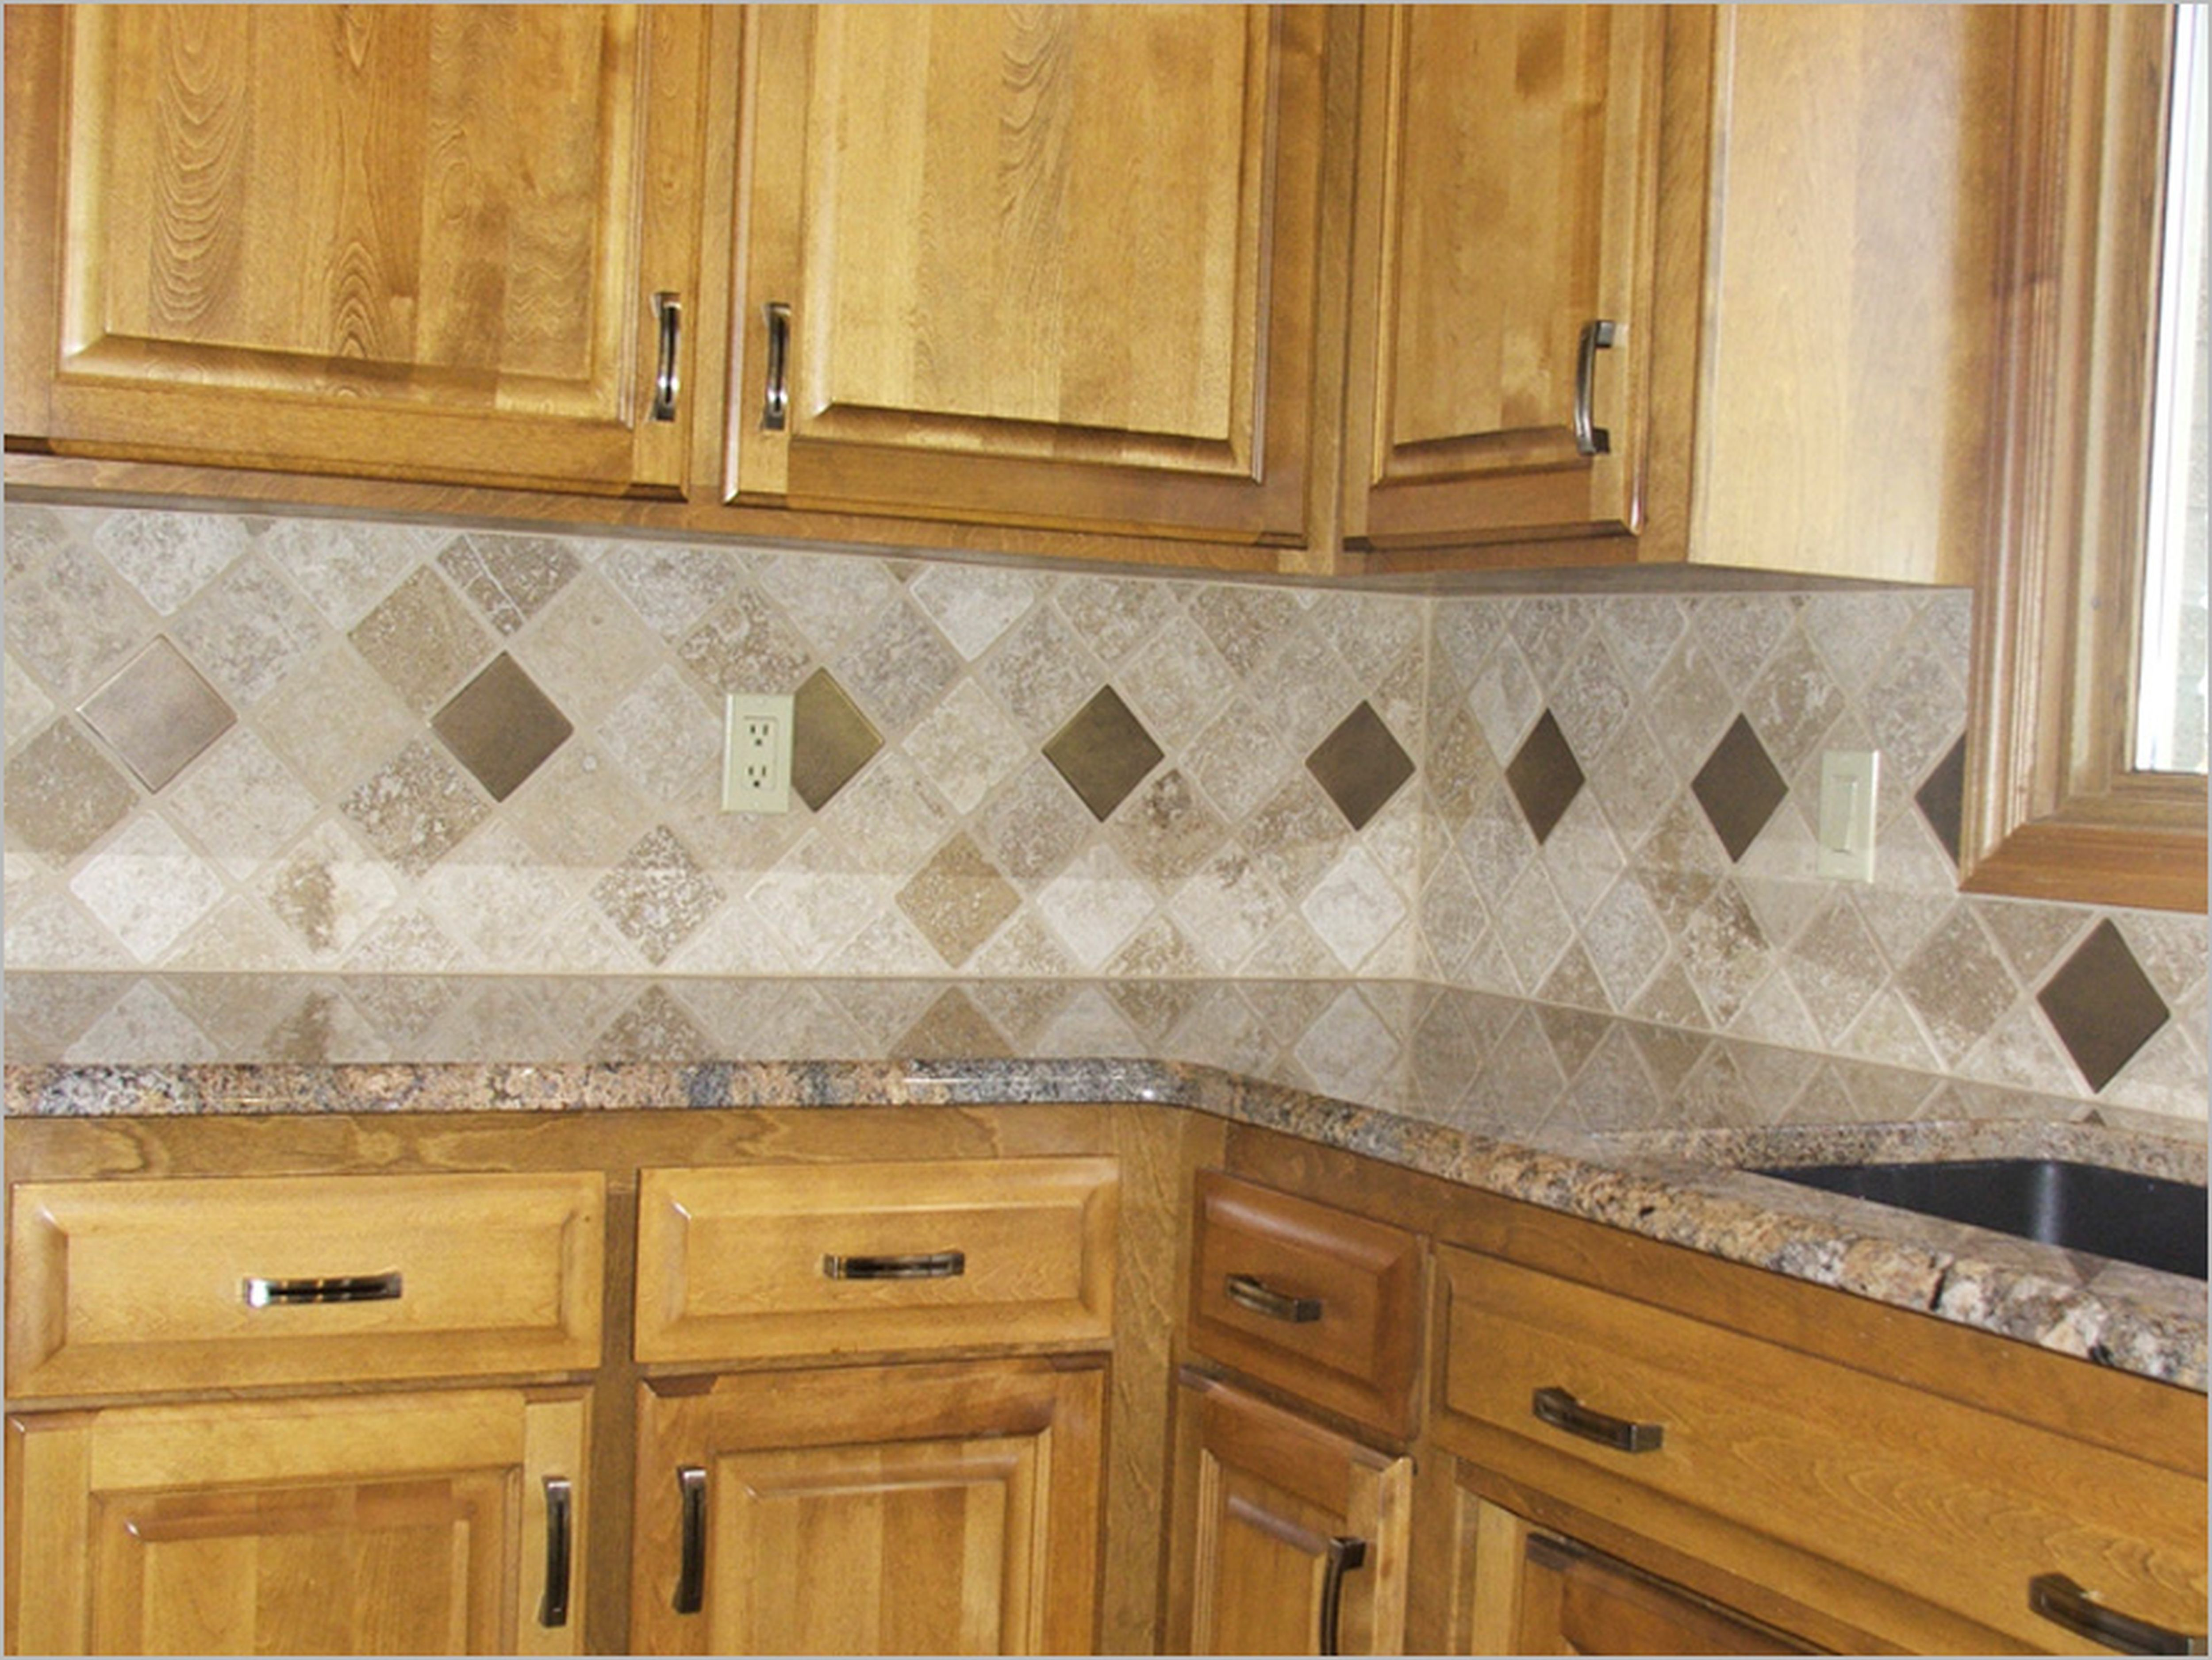 Kitchen Elegant Tile Backsplash Ideas Wooden Cabinets And Islands Design Unusual Fascinating Kitchens Contemporary